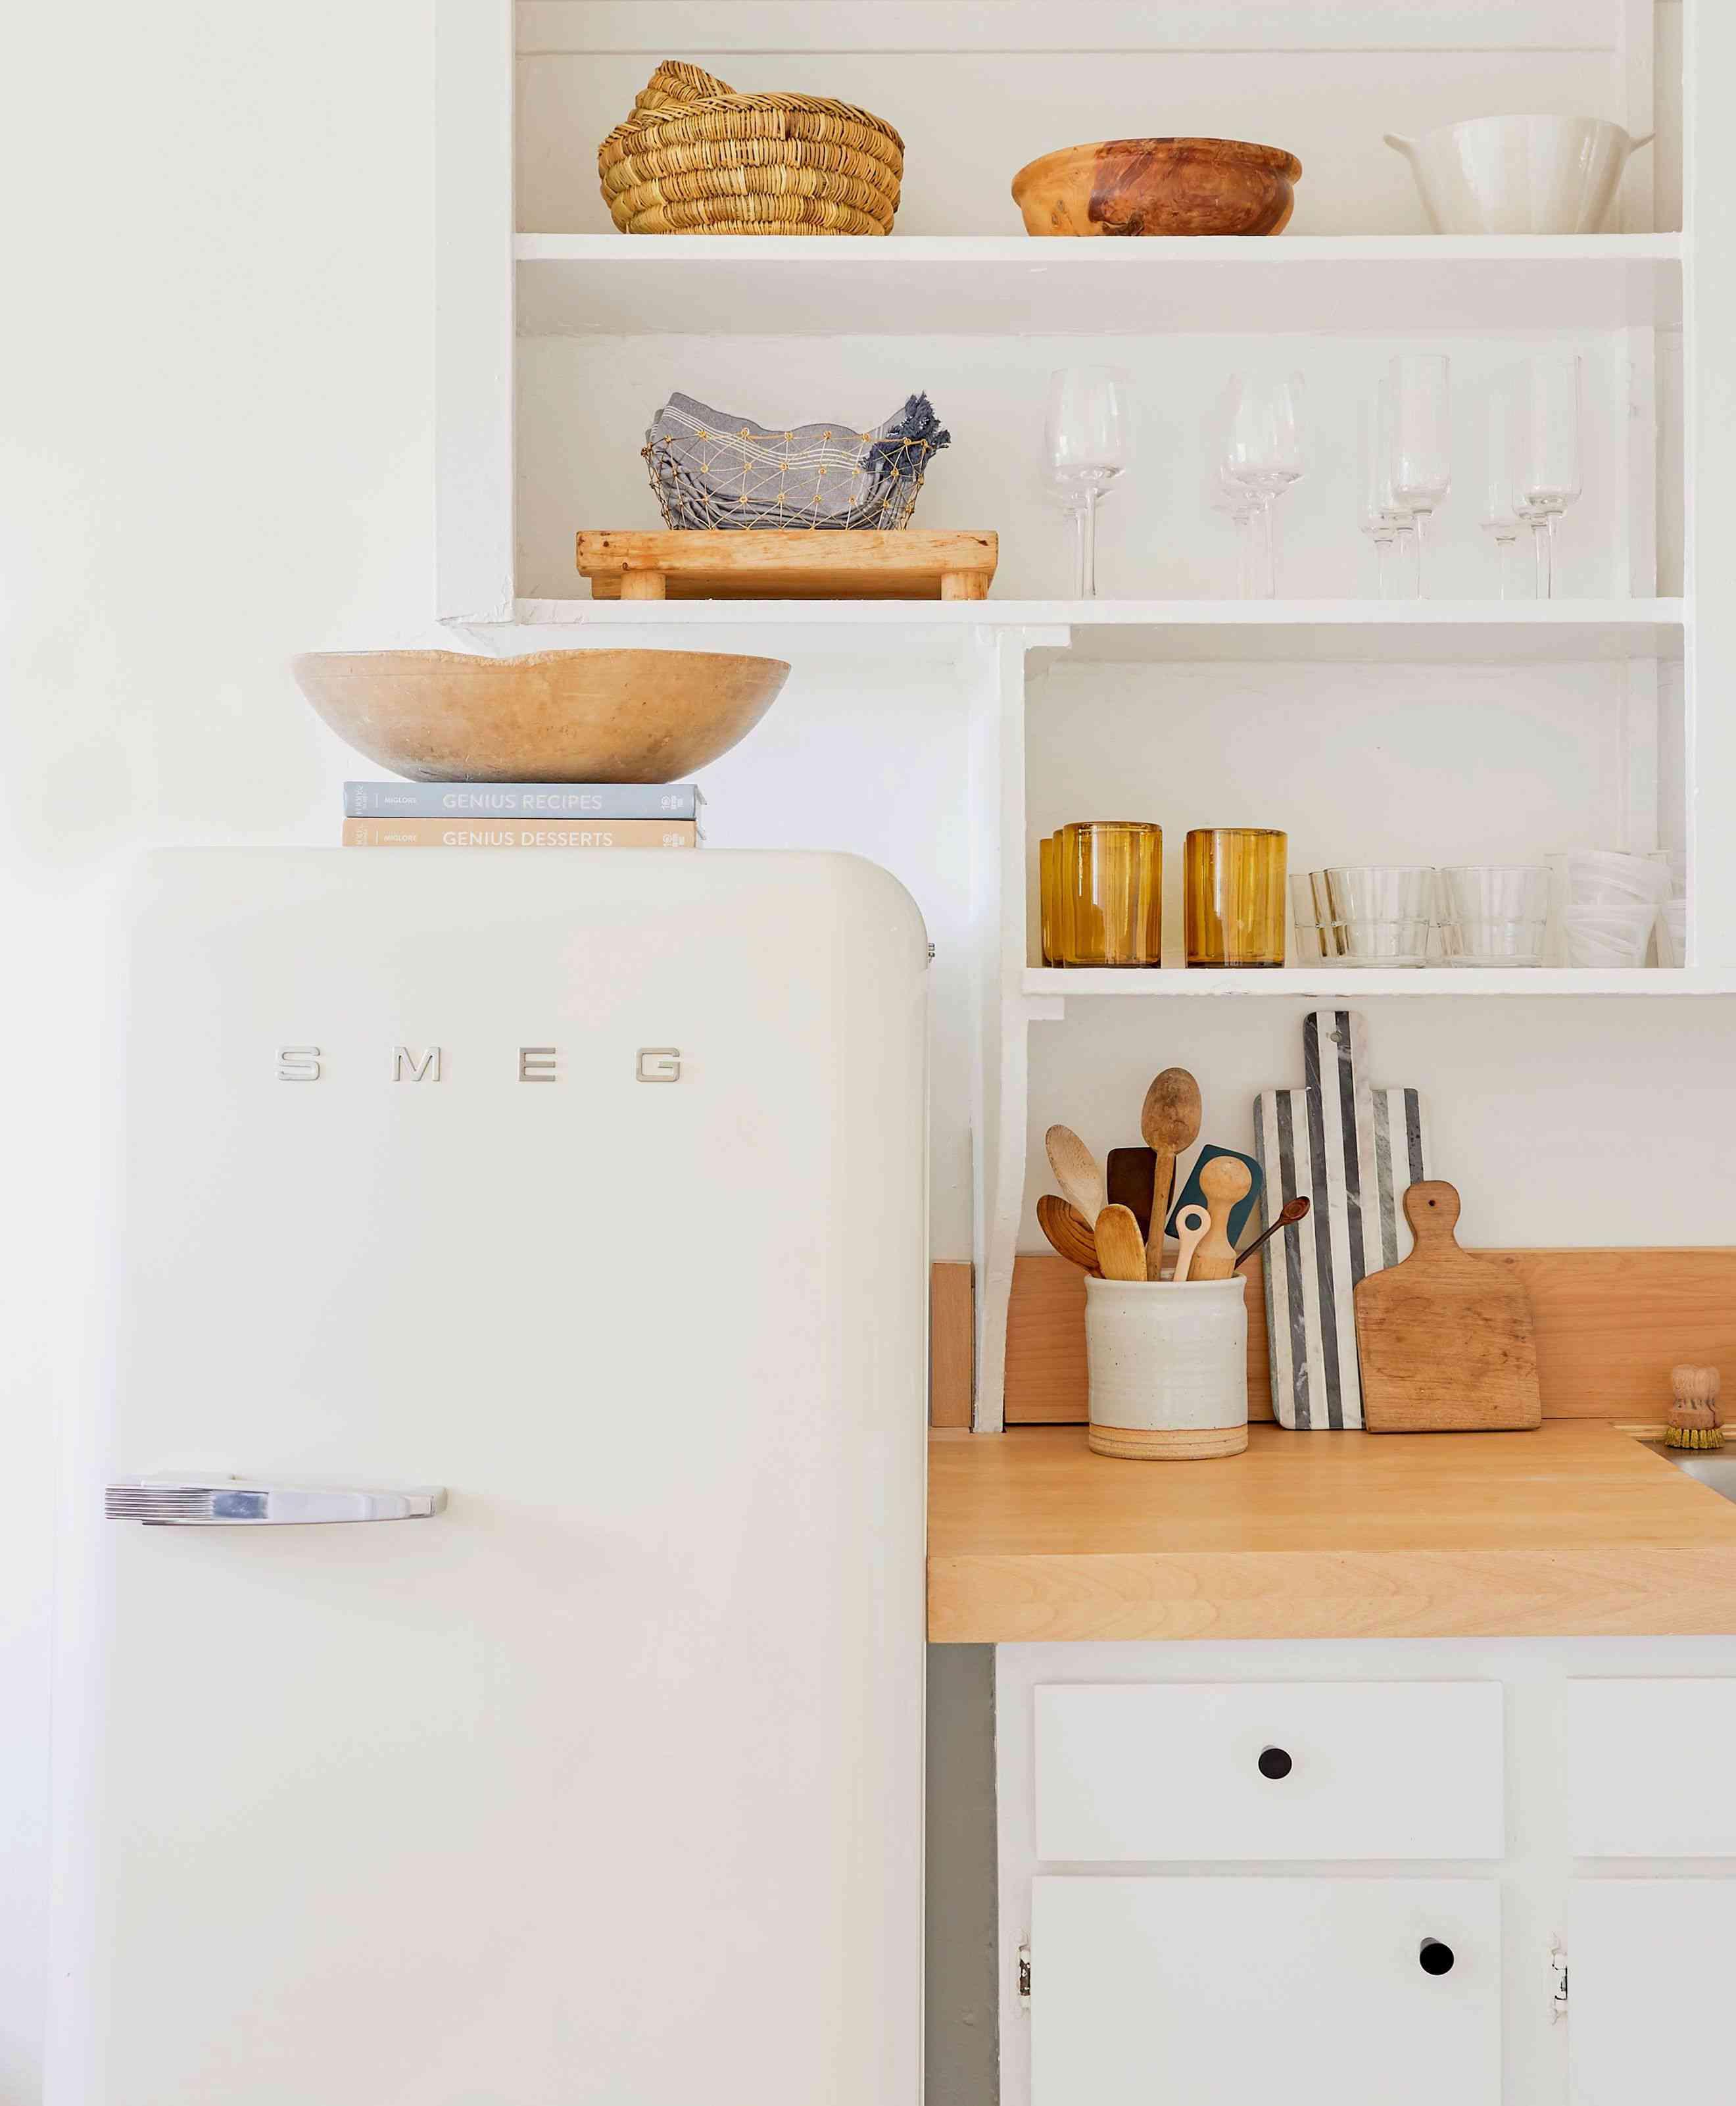 white modern kitchen with retro fridge cookbooks and bowl on top of fridge